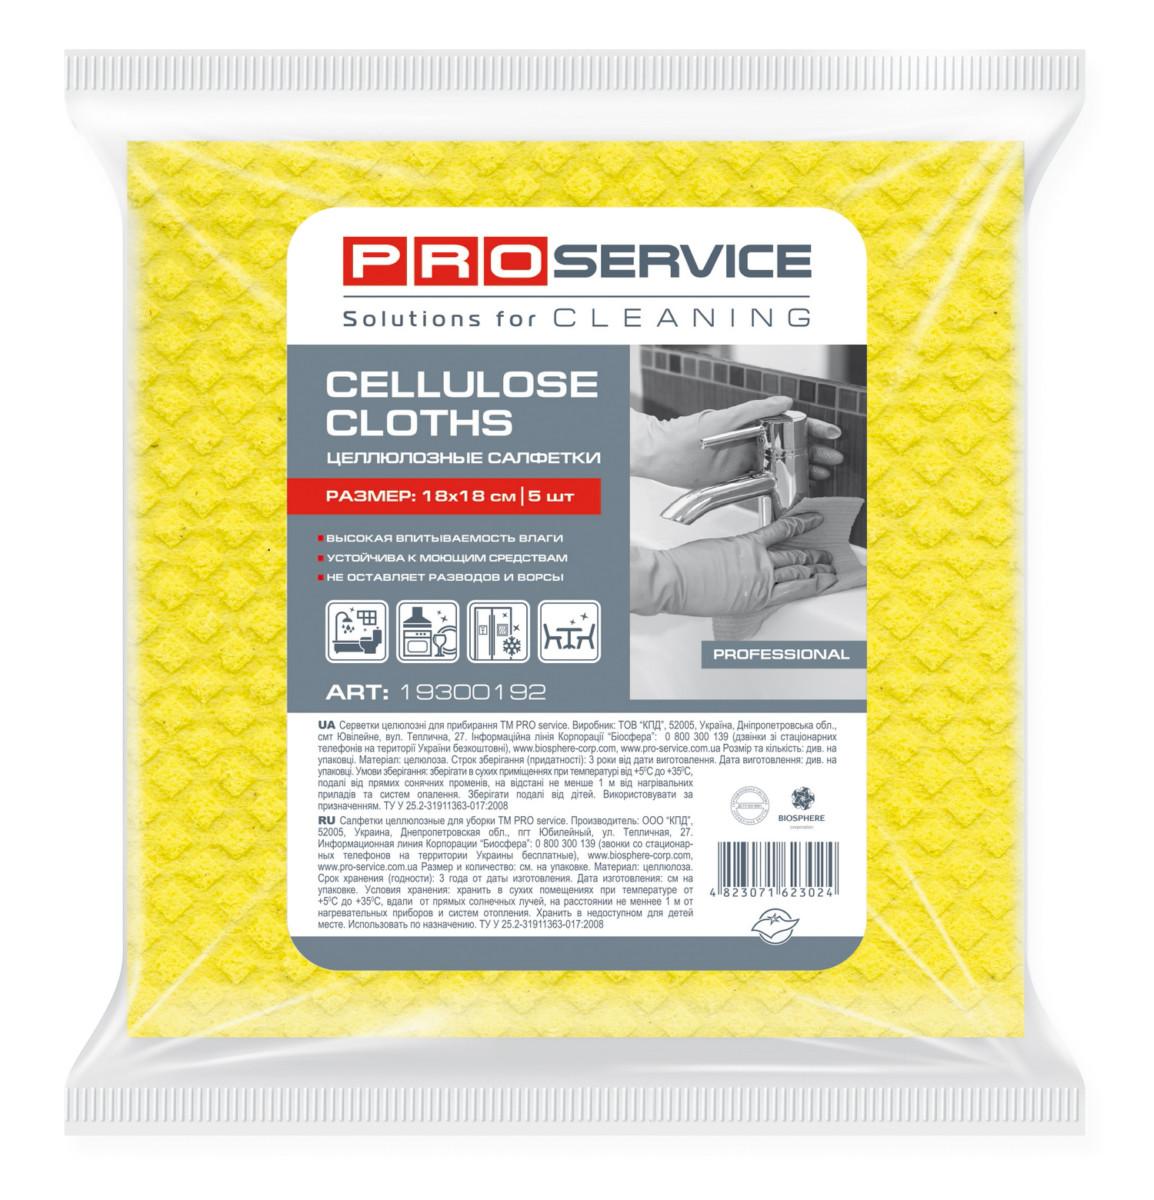 Серветки целюлознi PRO service Professional жовті, 5 шт- Фото - Biosphere